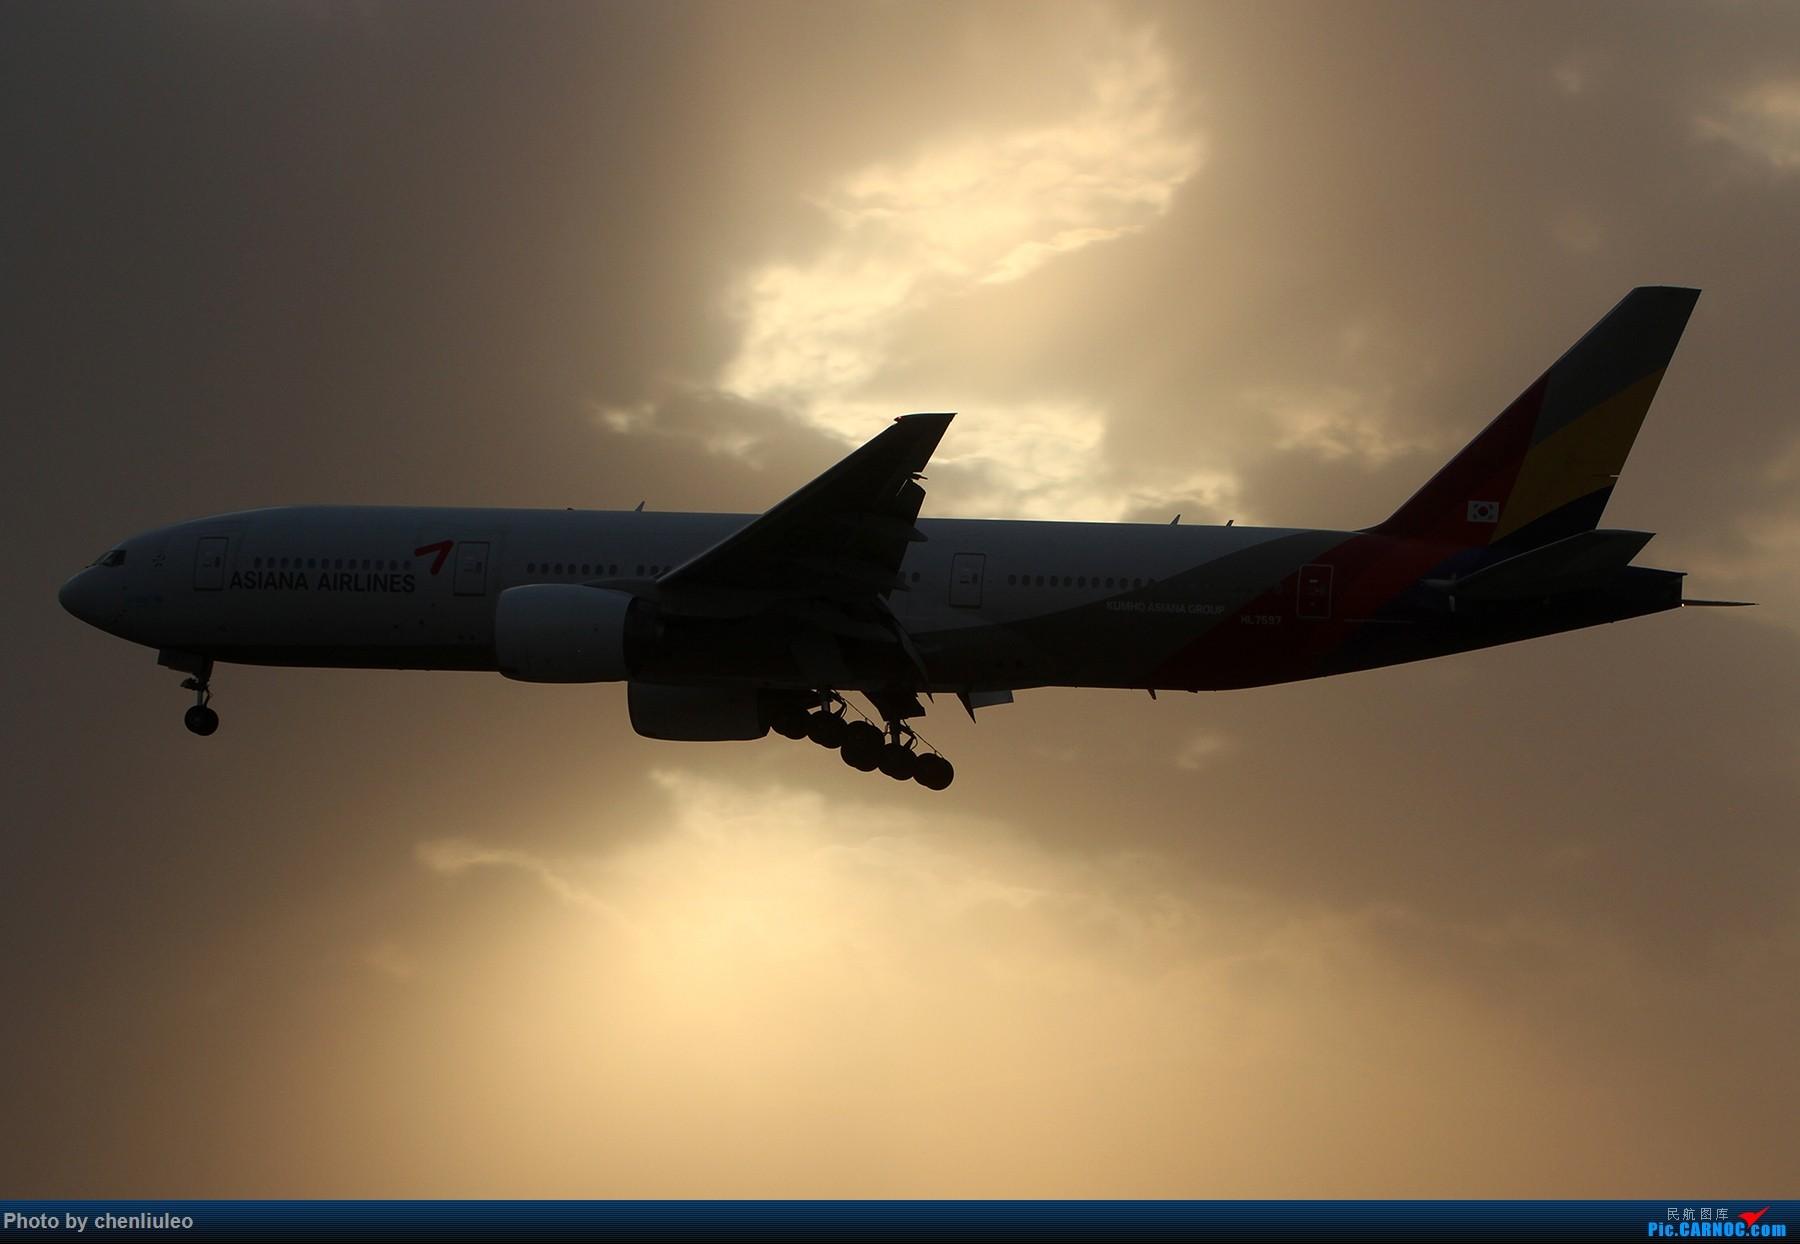 Re:[原创]【北美飞友会】芝加哥奥黑尔机场首拍 BOEING 777-200ER HL7597 美国芝加哥奥黑尔国际机场